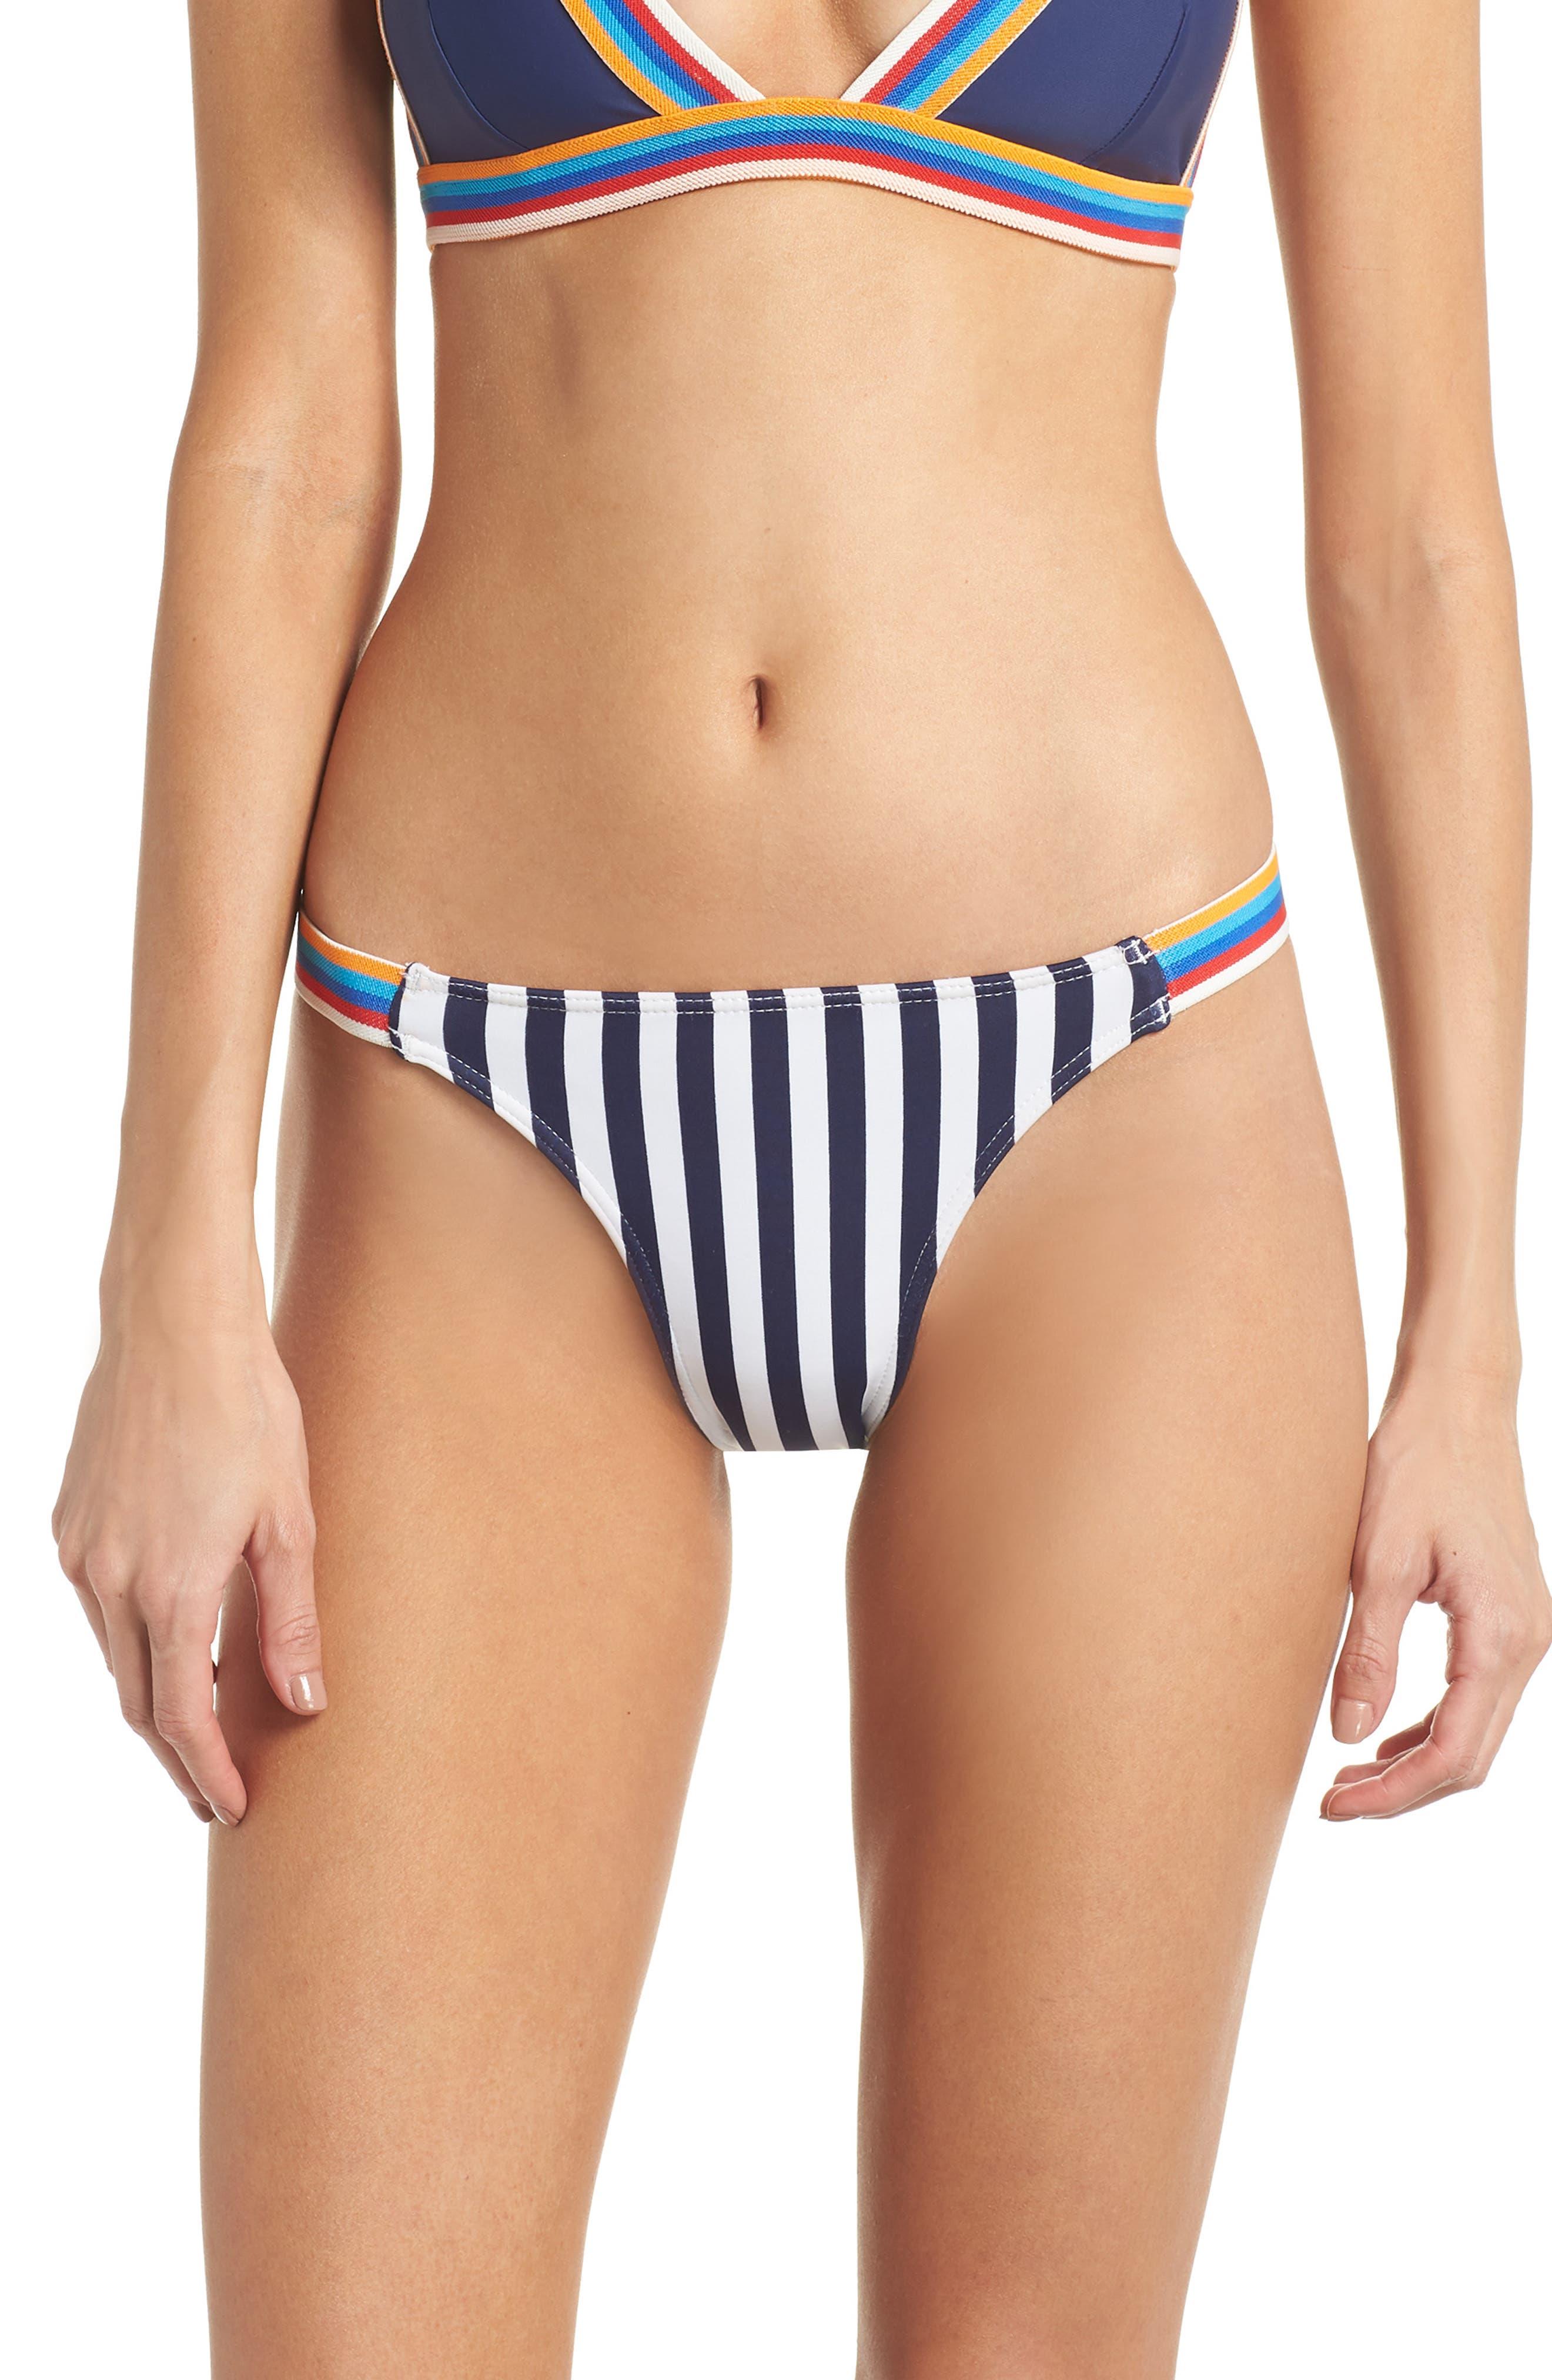 Sizzle Bikini Bottoms,                             Main thumbnail 1, color,                             Navy